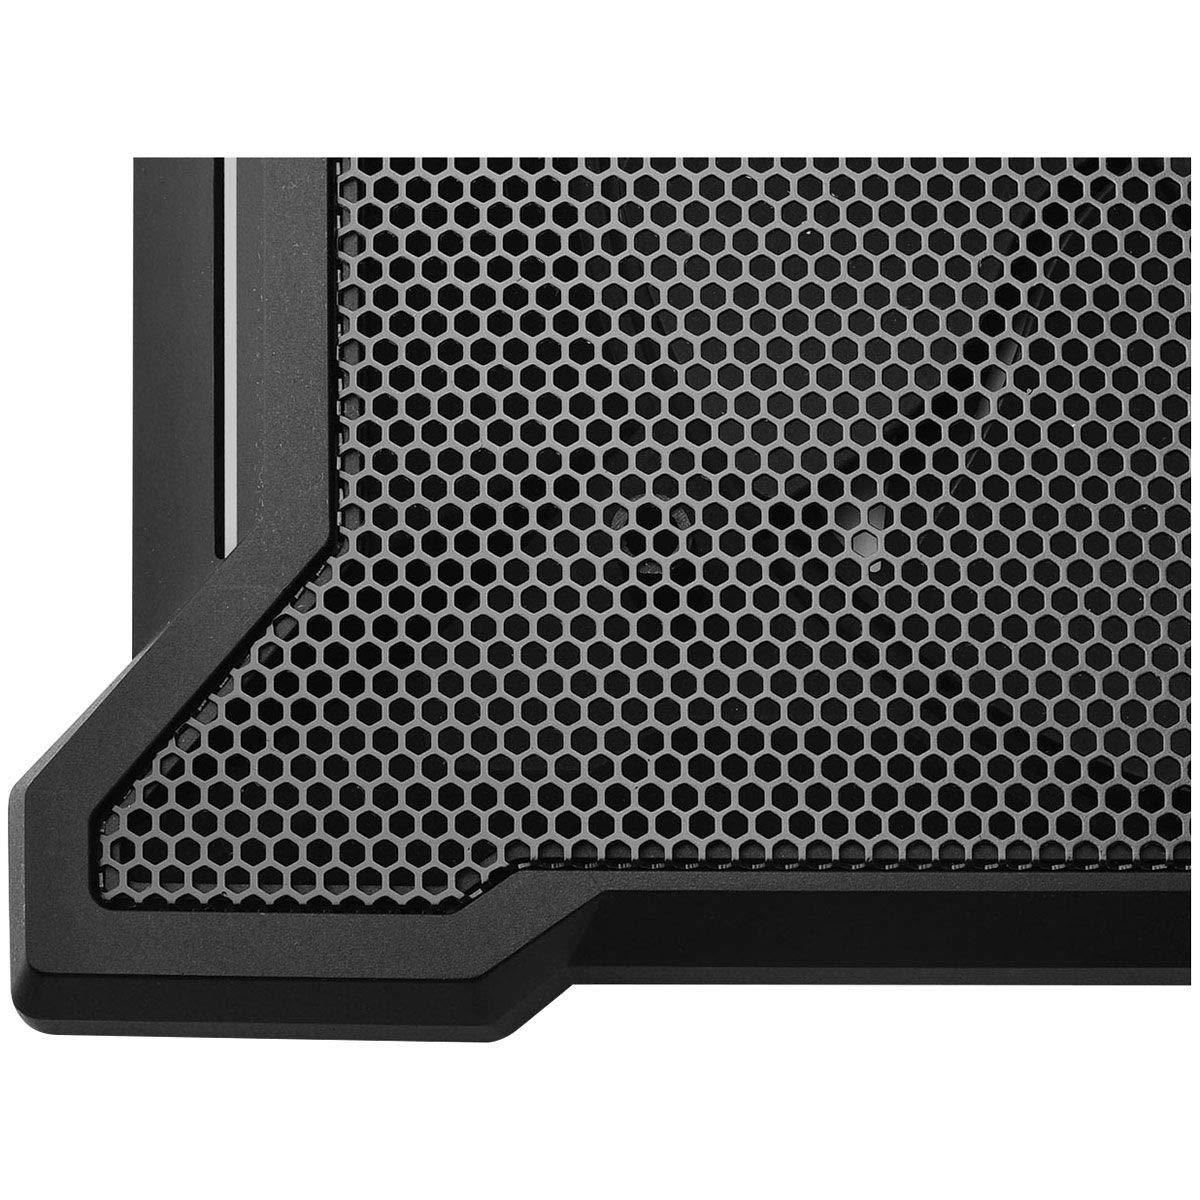 Cooler Master NotePal X-Slim II Laptop Cooling Pad 'Silent 200mm Fan, Egonomic Design, Supports up to 15.6'' laptops' R9-NBC-XS2K-GP by Cooler Master (Image #2)